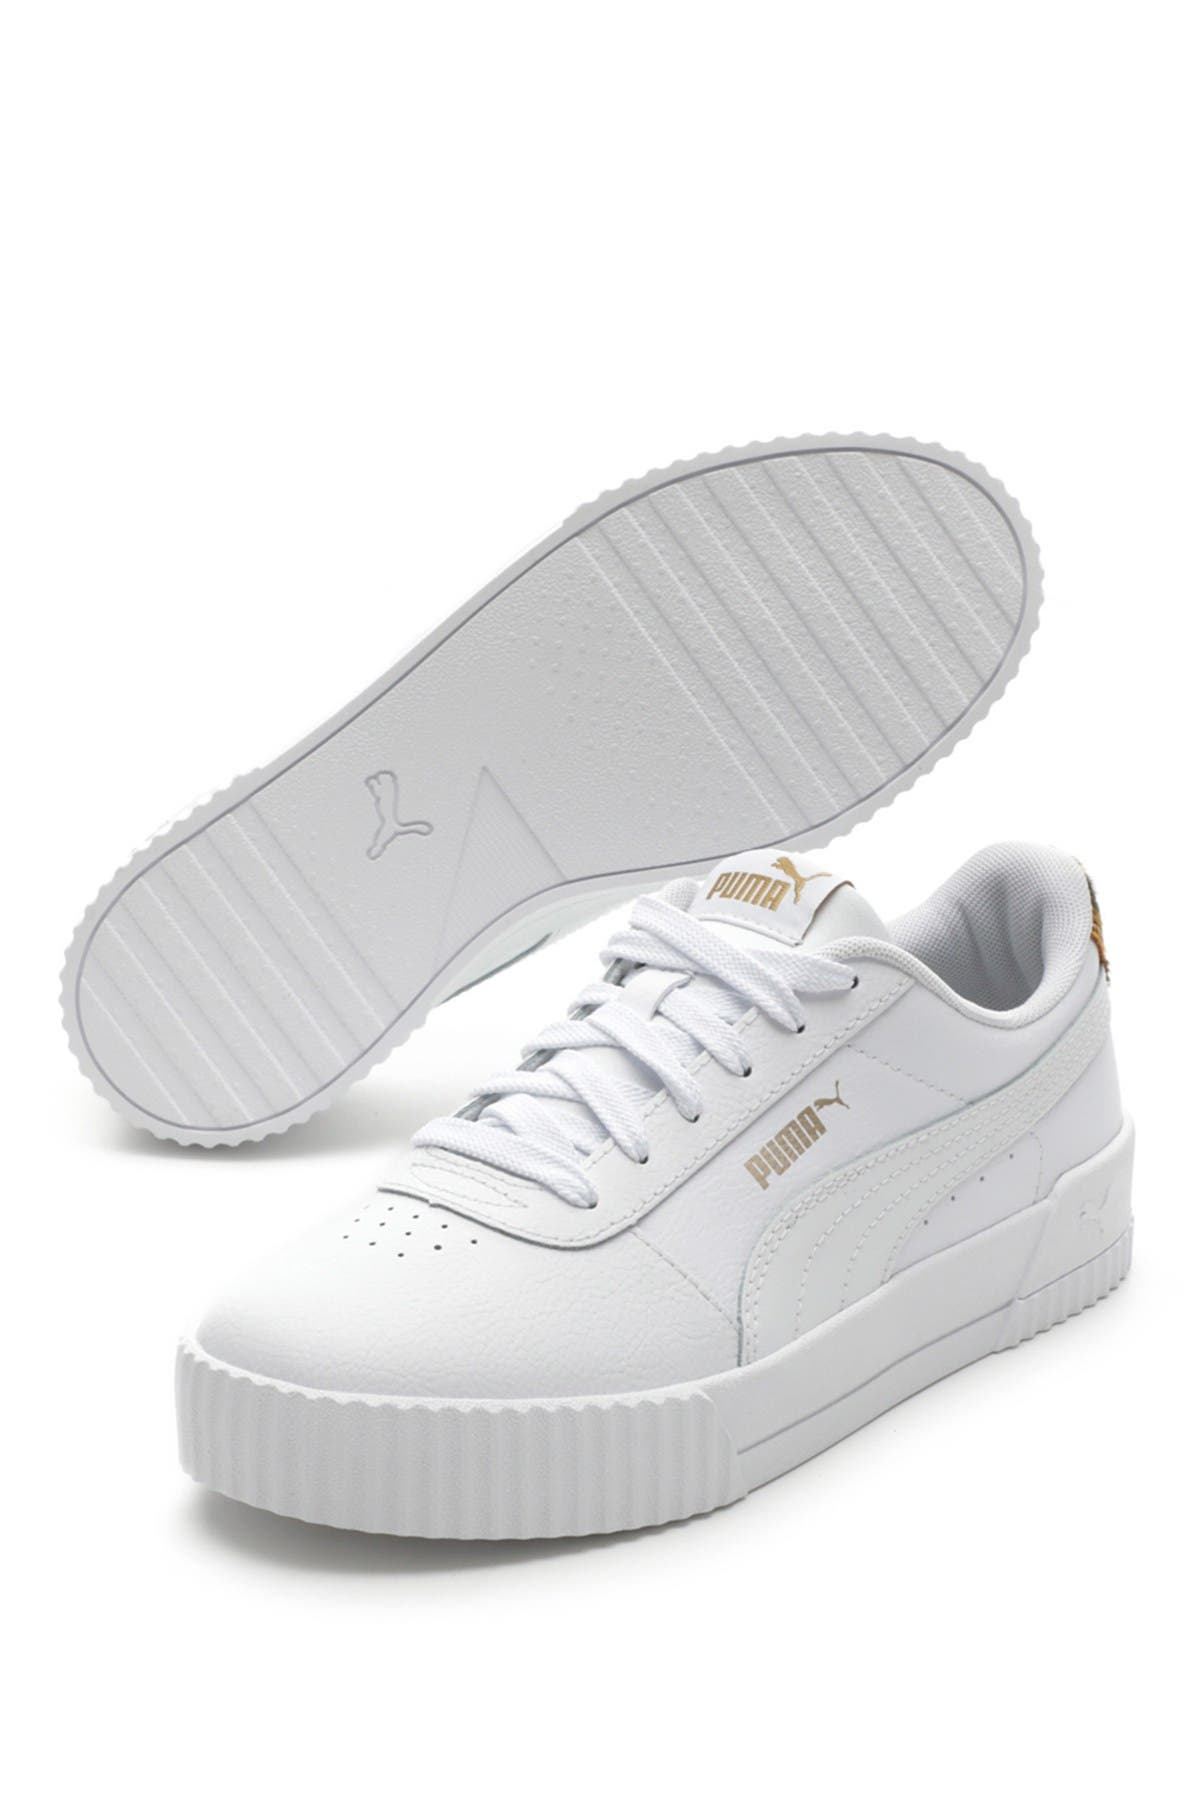 PUMA | Carina Leo L Sneaker | Nordstrom